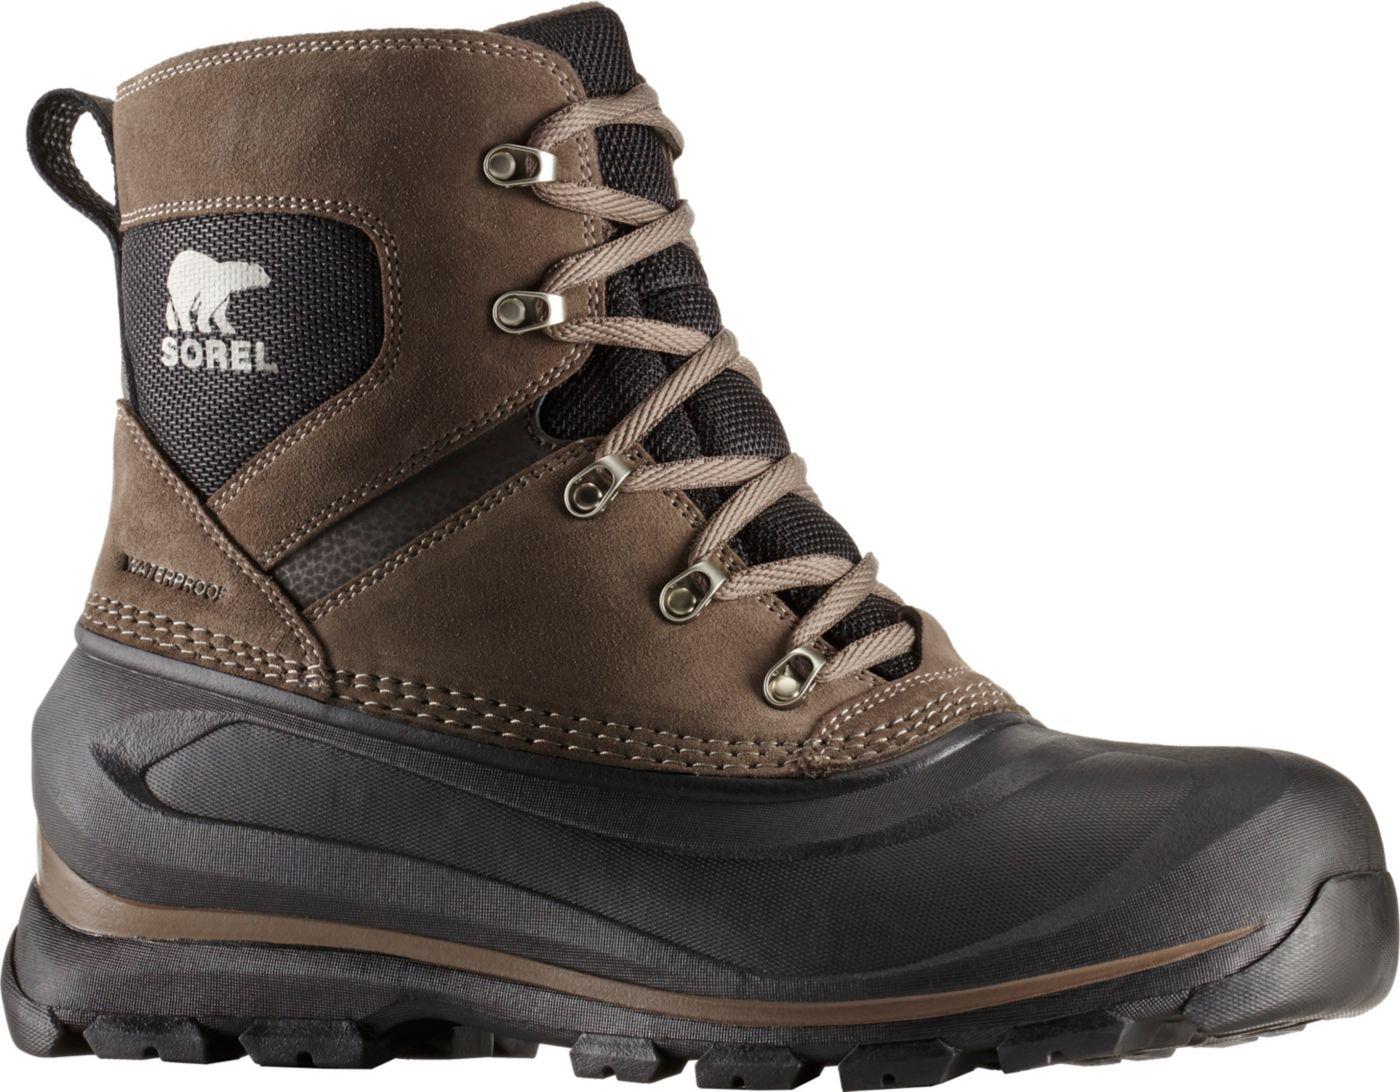 SOREL Men's Buxton Lace 200g Waterproof Winter Boots